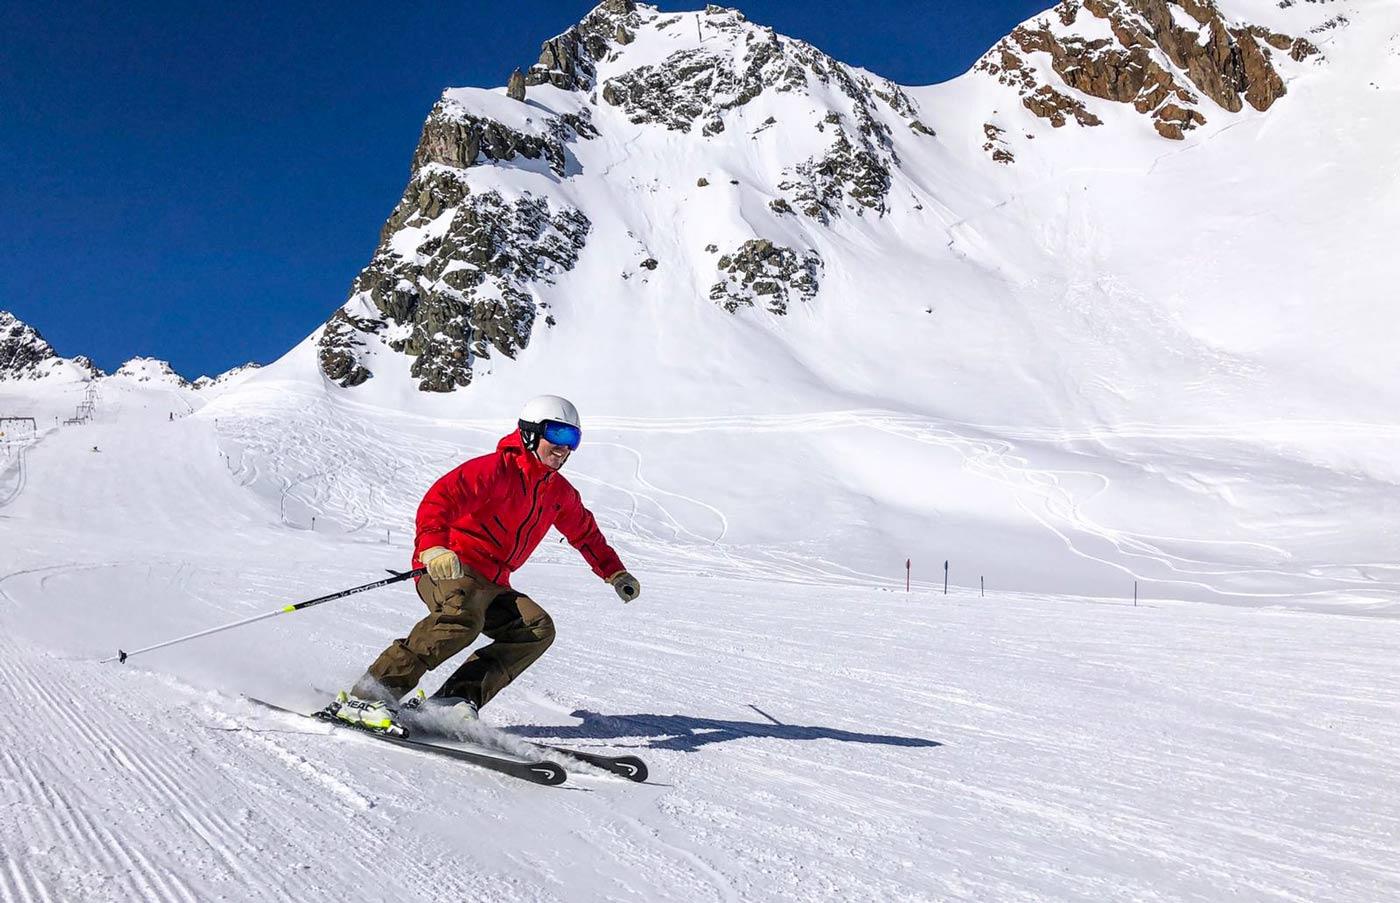 Skiën op wintersport op de piste